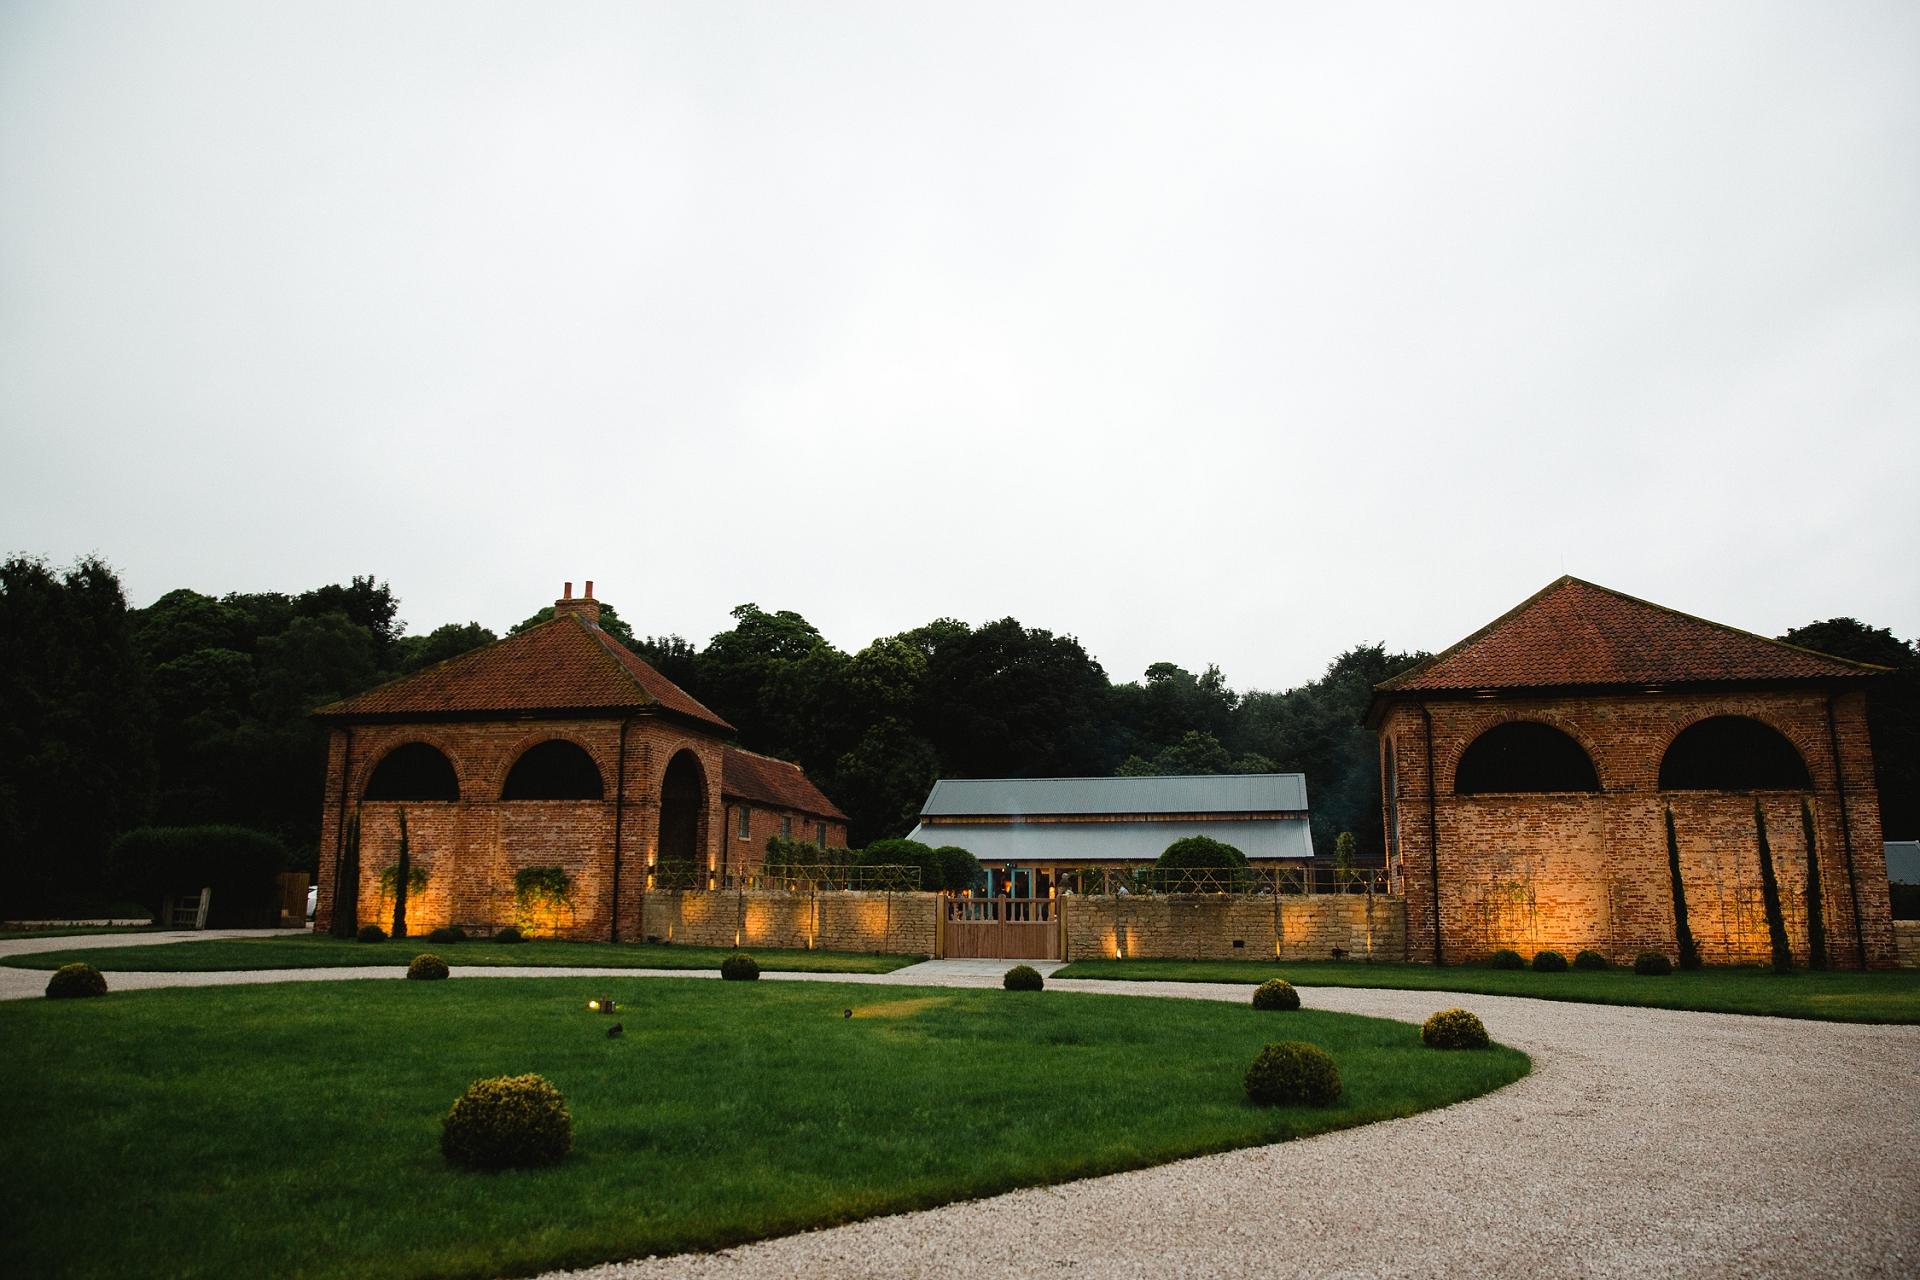 Hazel Gap Barn Wedding venue in the evening